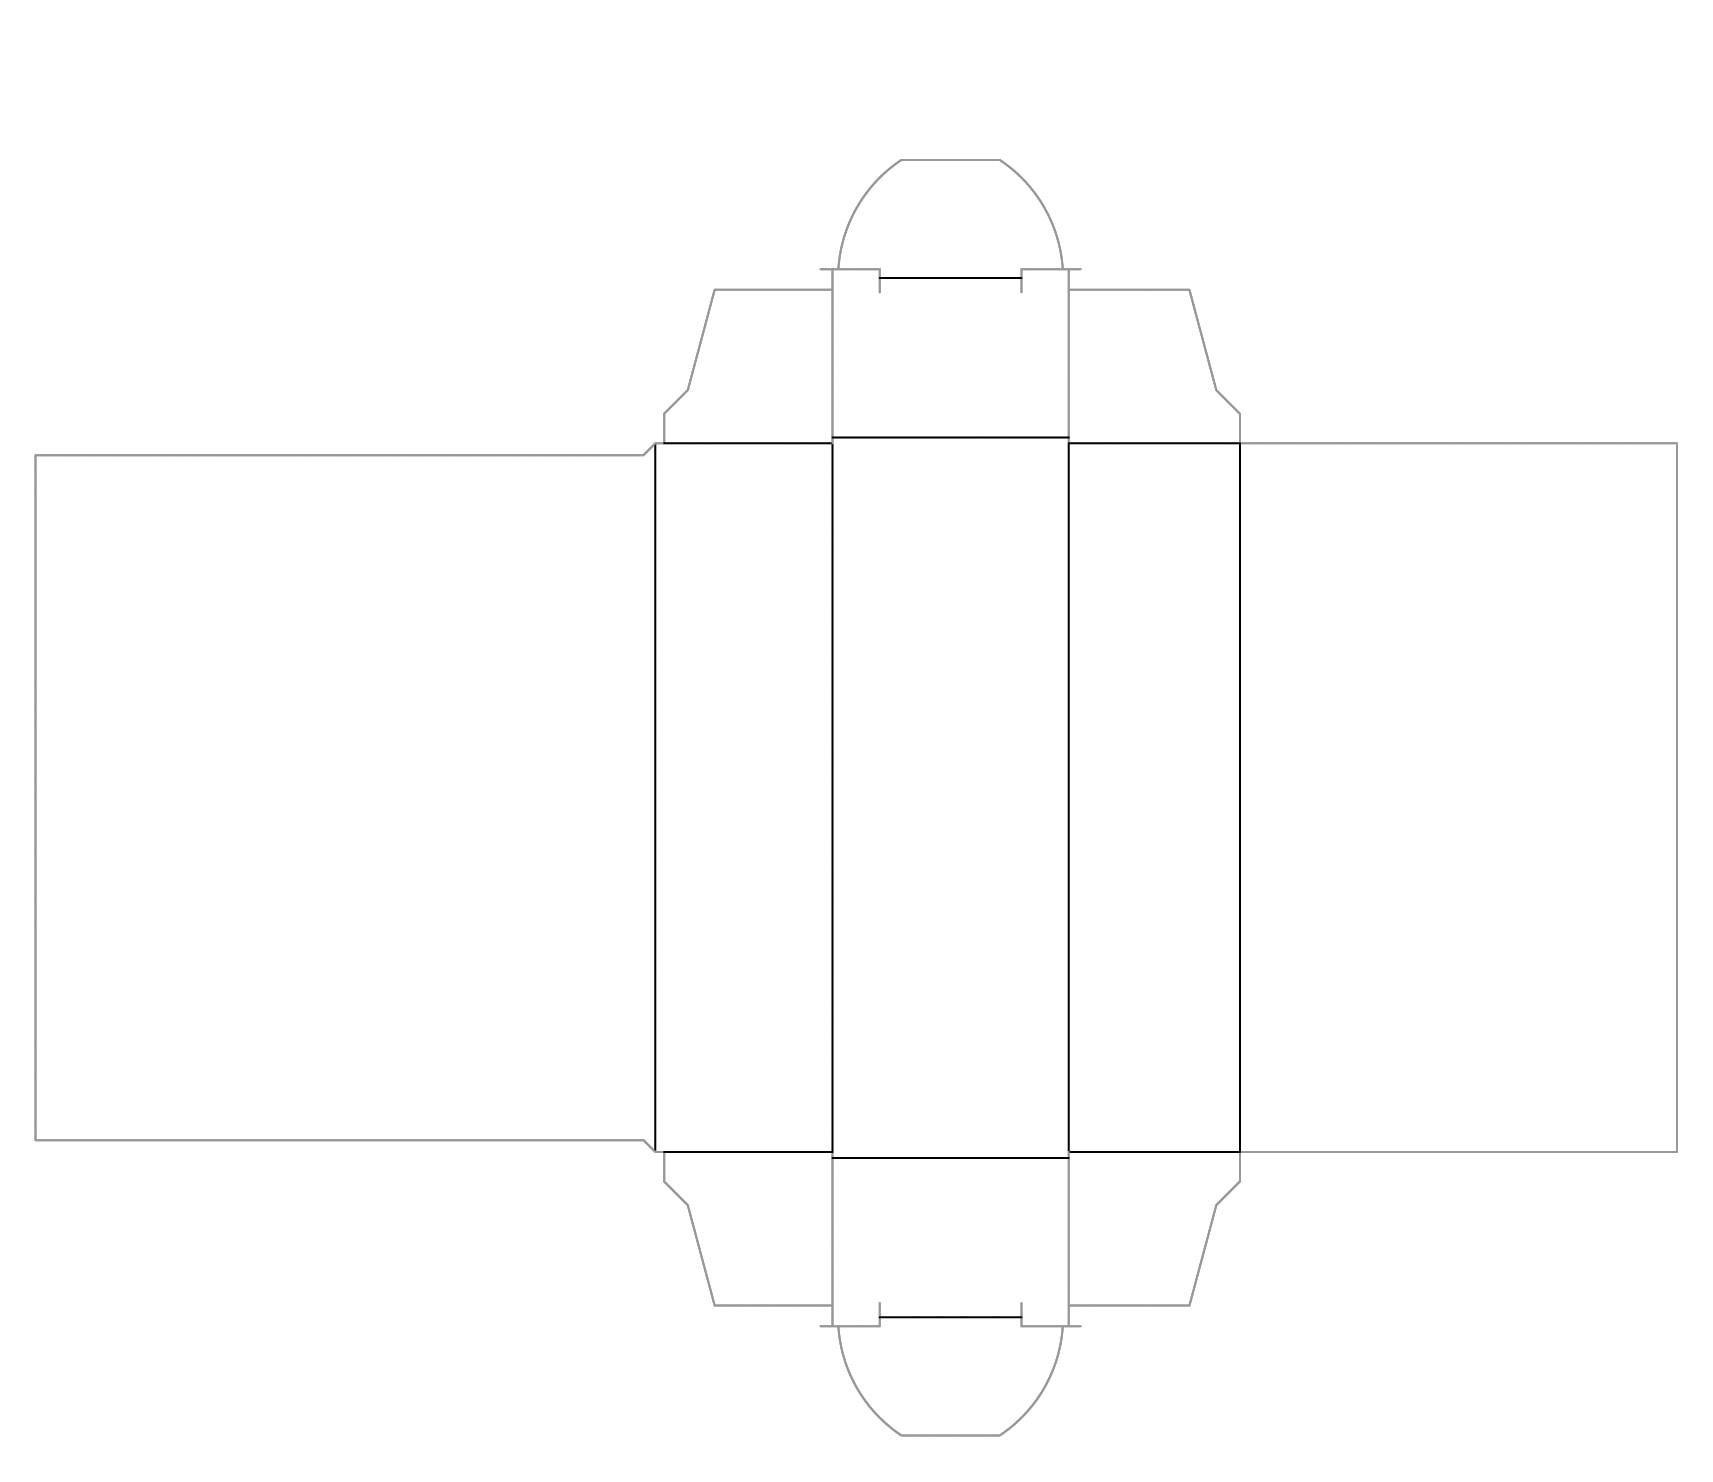 Kartonhülle für USB-Stick, Kartonschächteli für USB-Stick